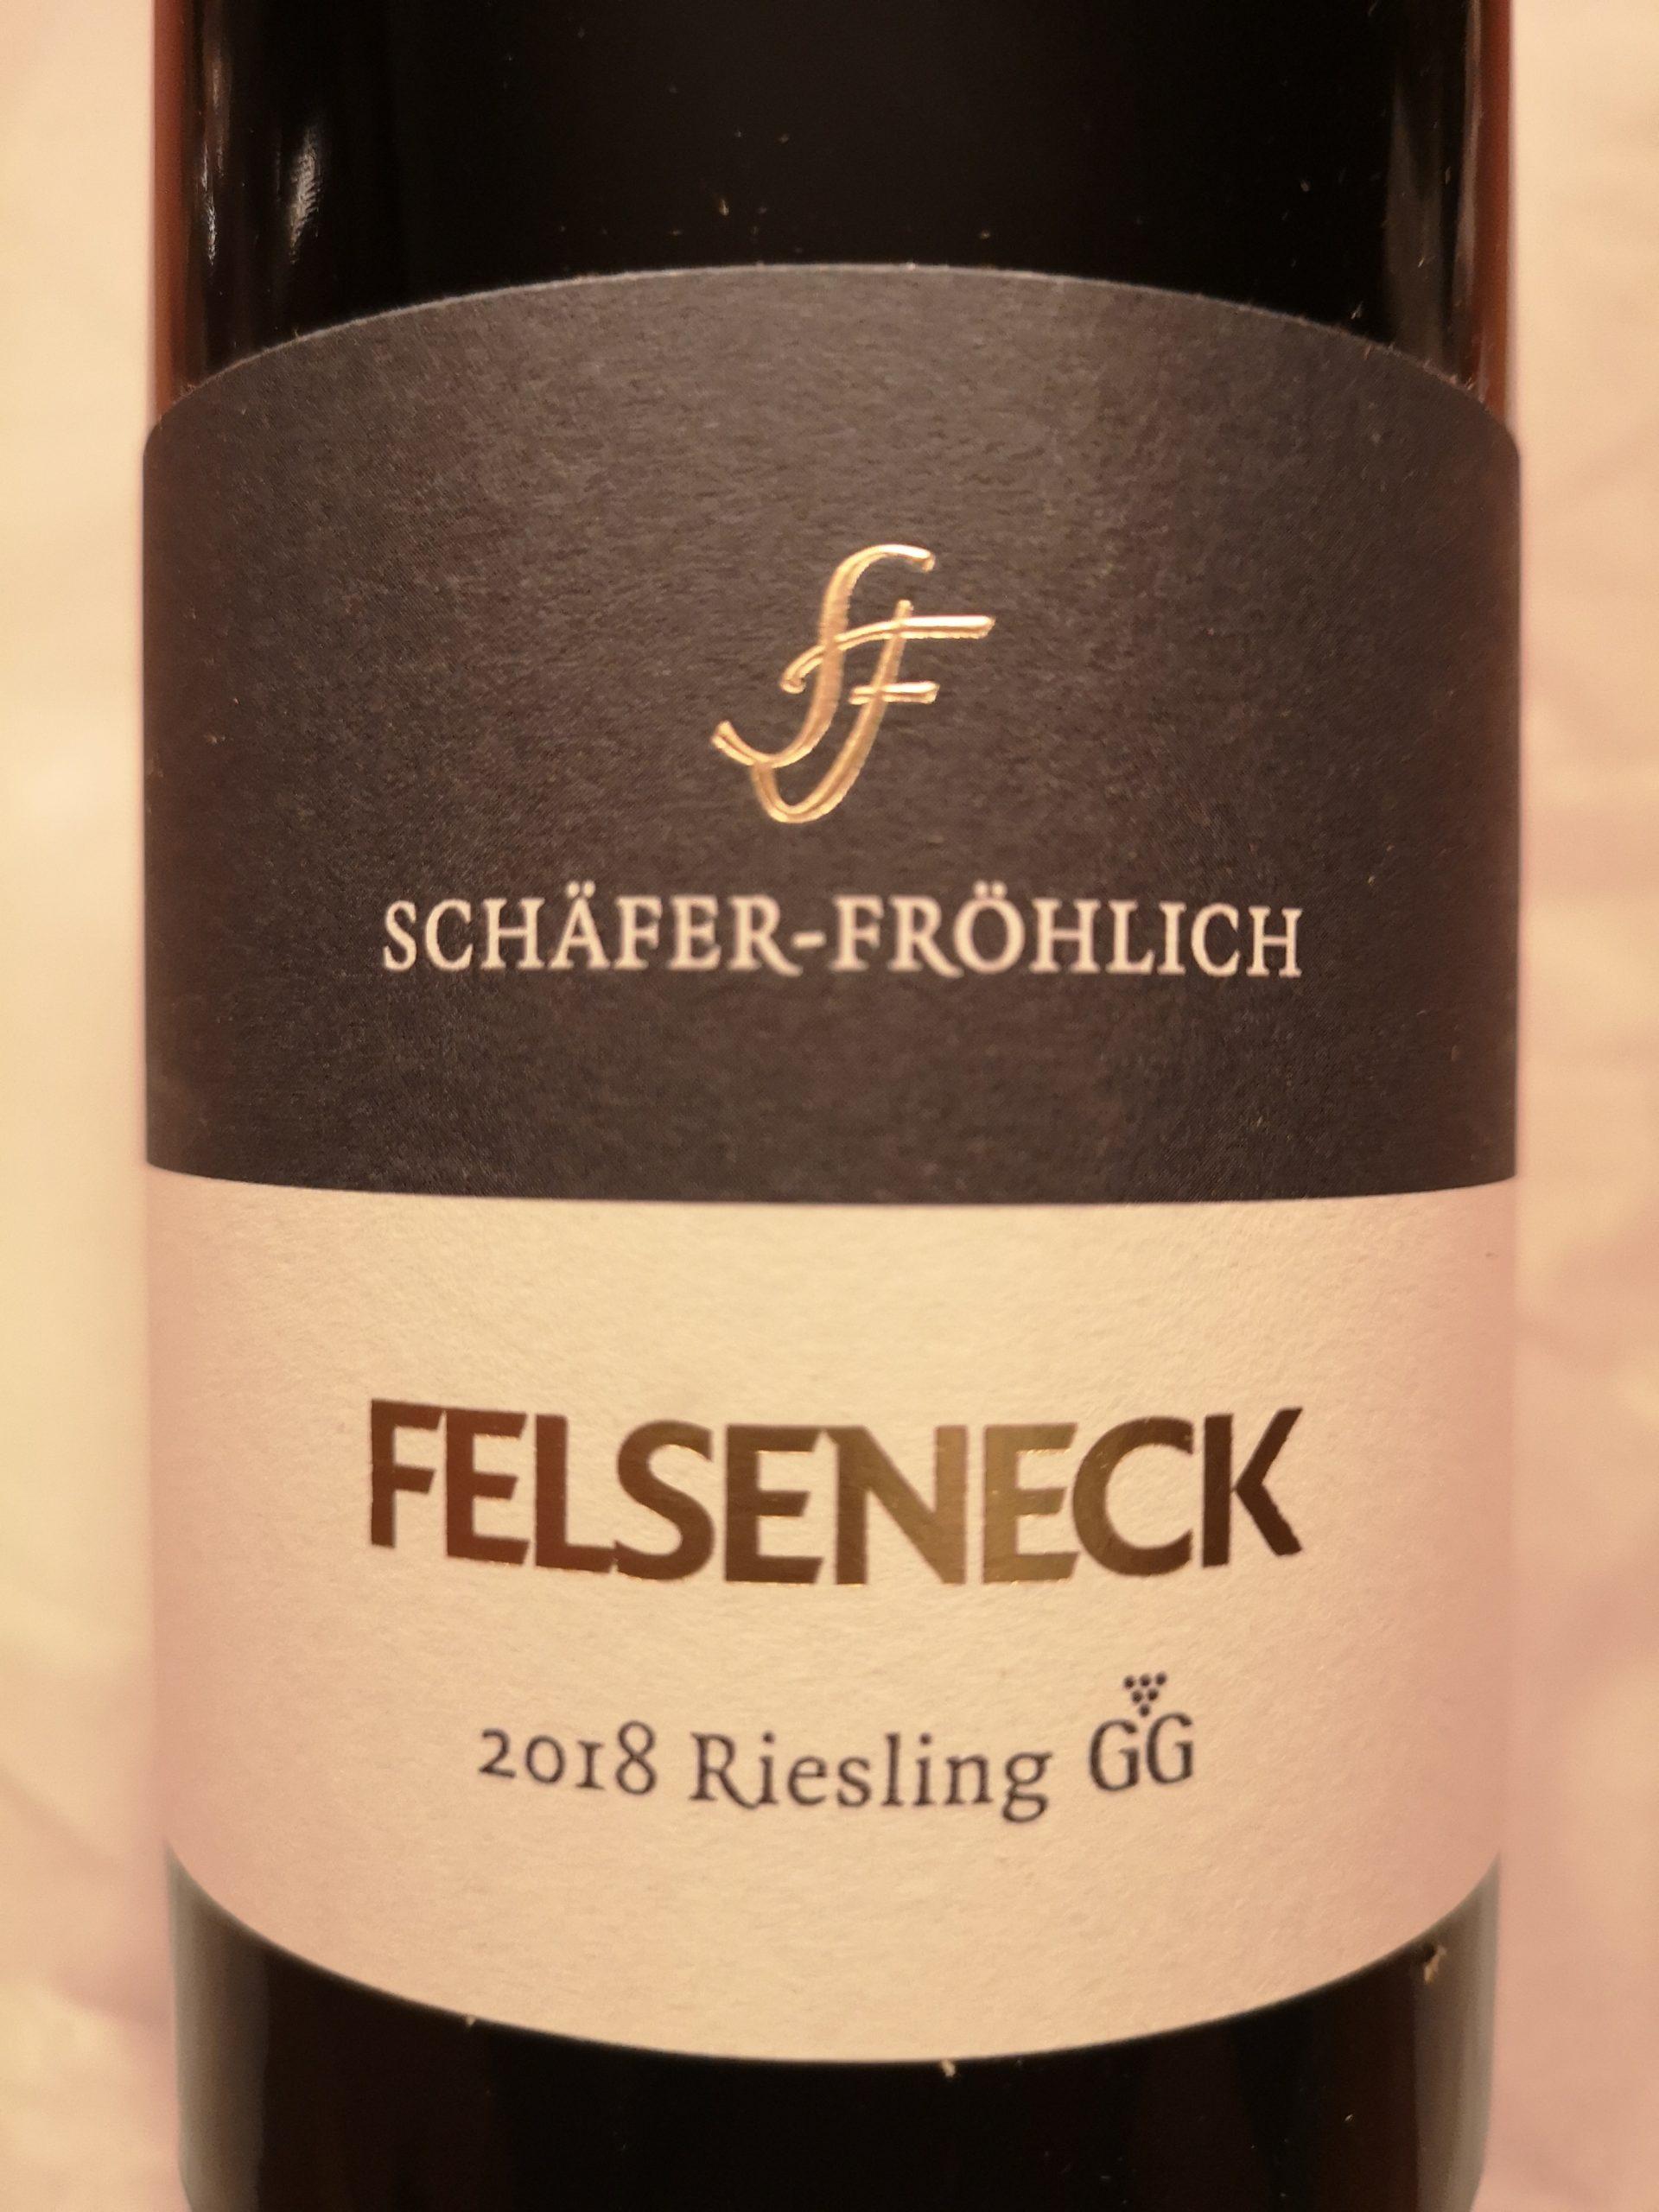 2018 Riesling Felseneck GG | Schäfer-Fröhlich